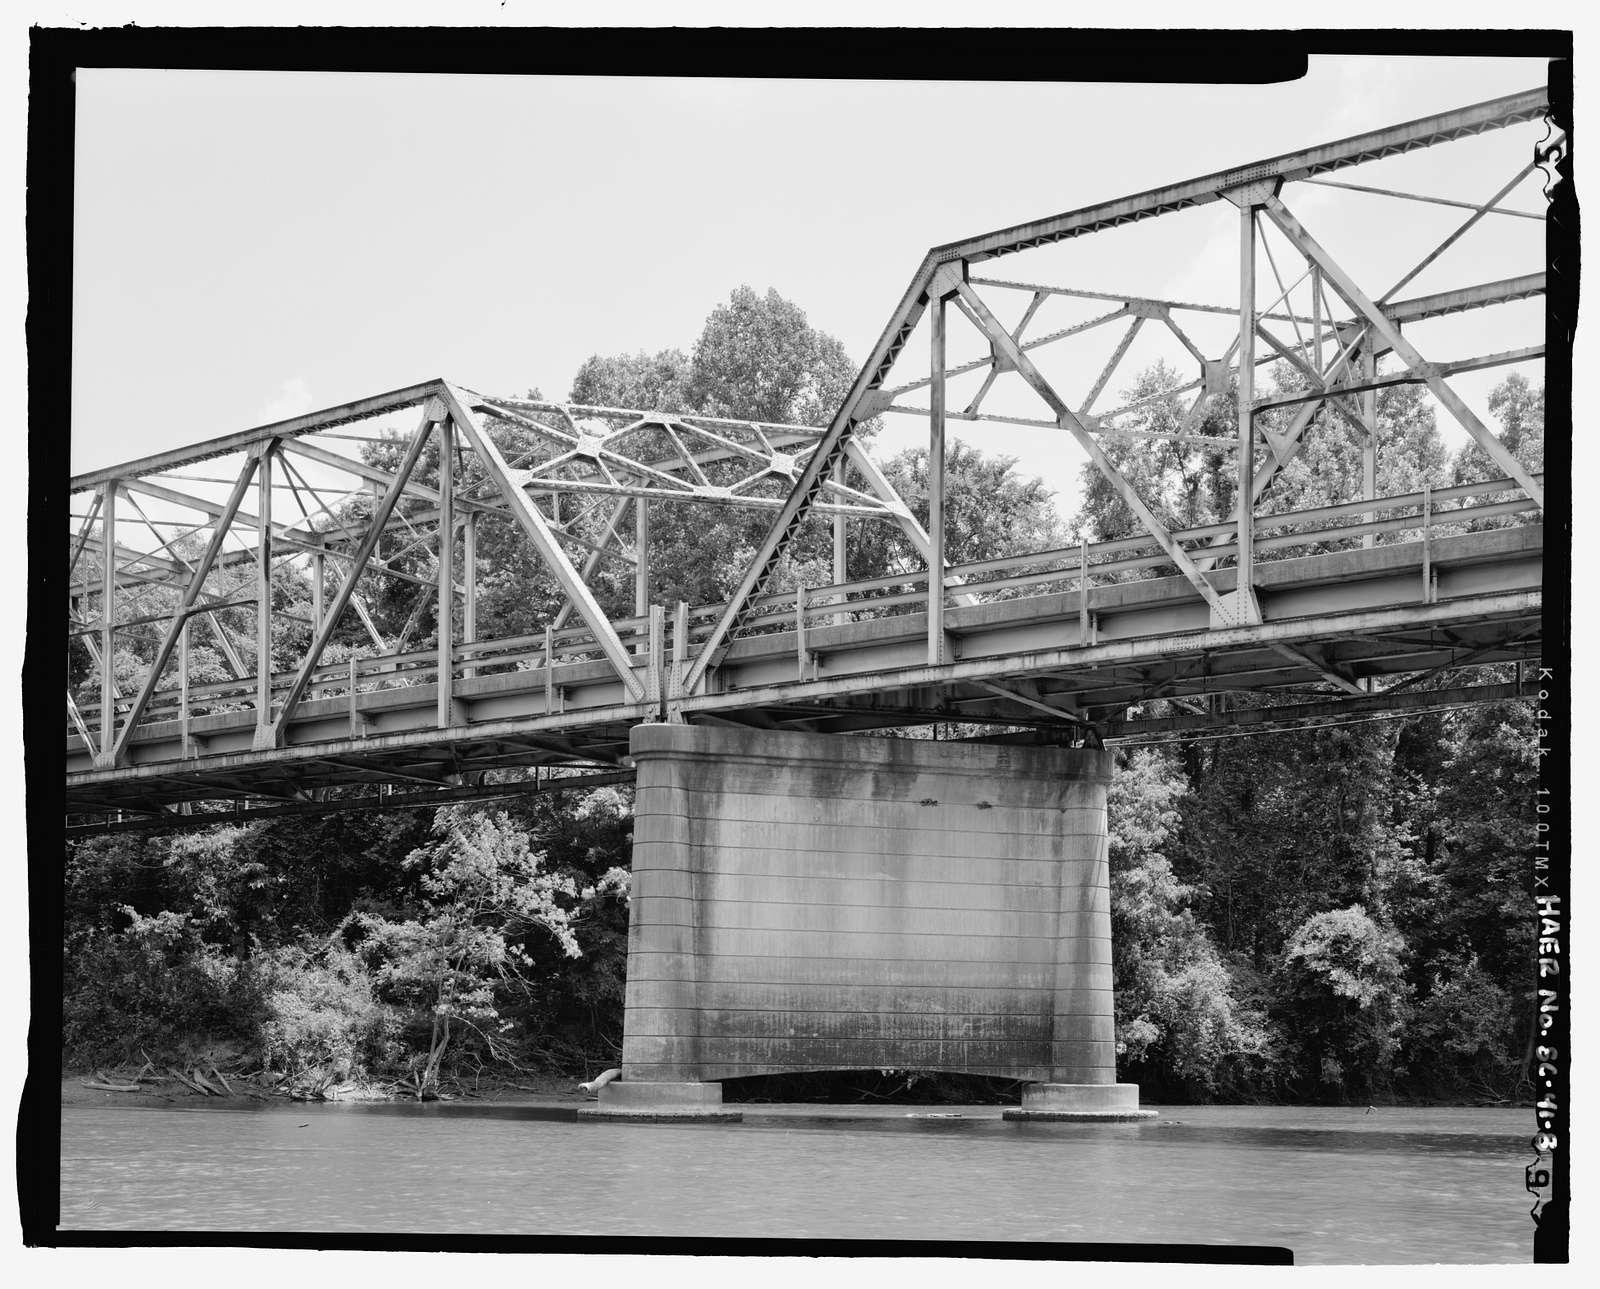 Broad River Bridge, Spanning Broad River at U.S. Highway 29, Gaffney, Cherokee County, SC